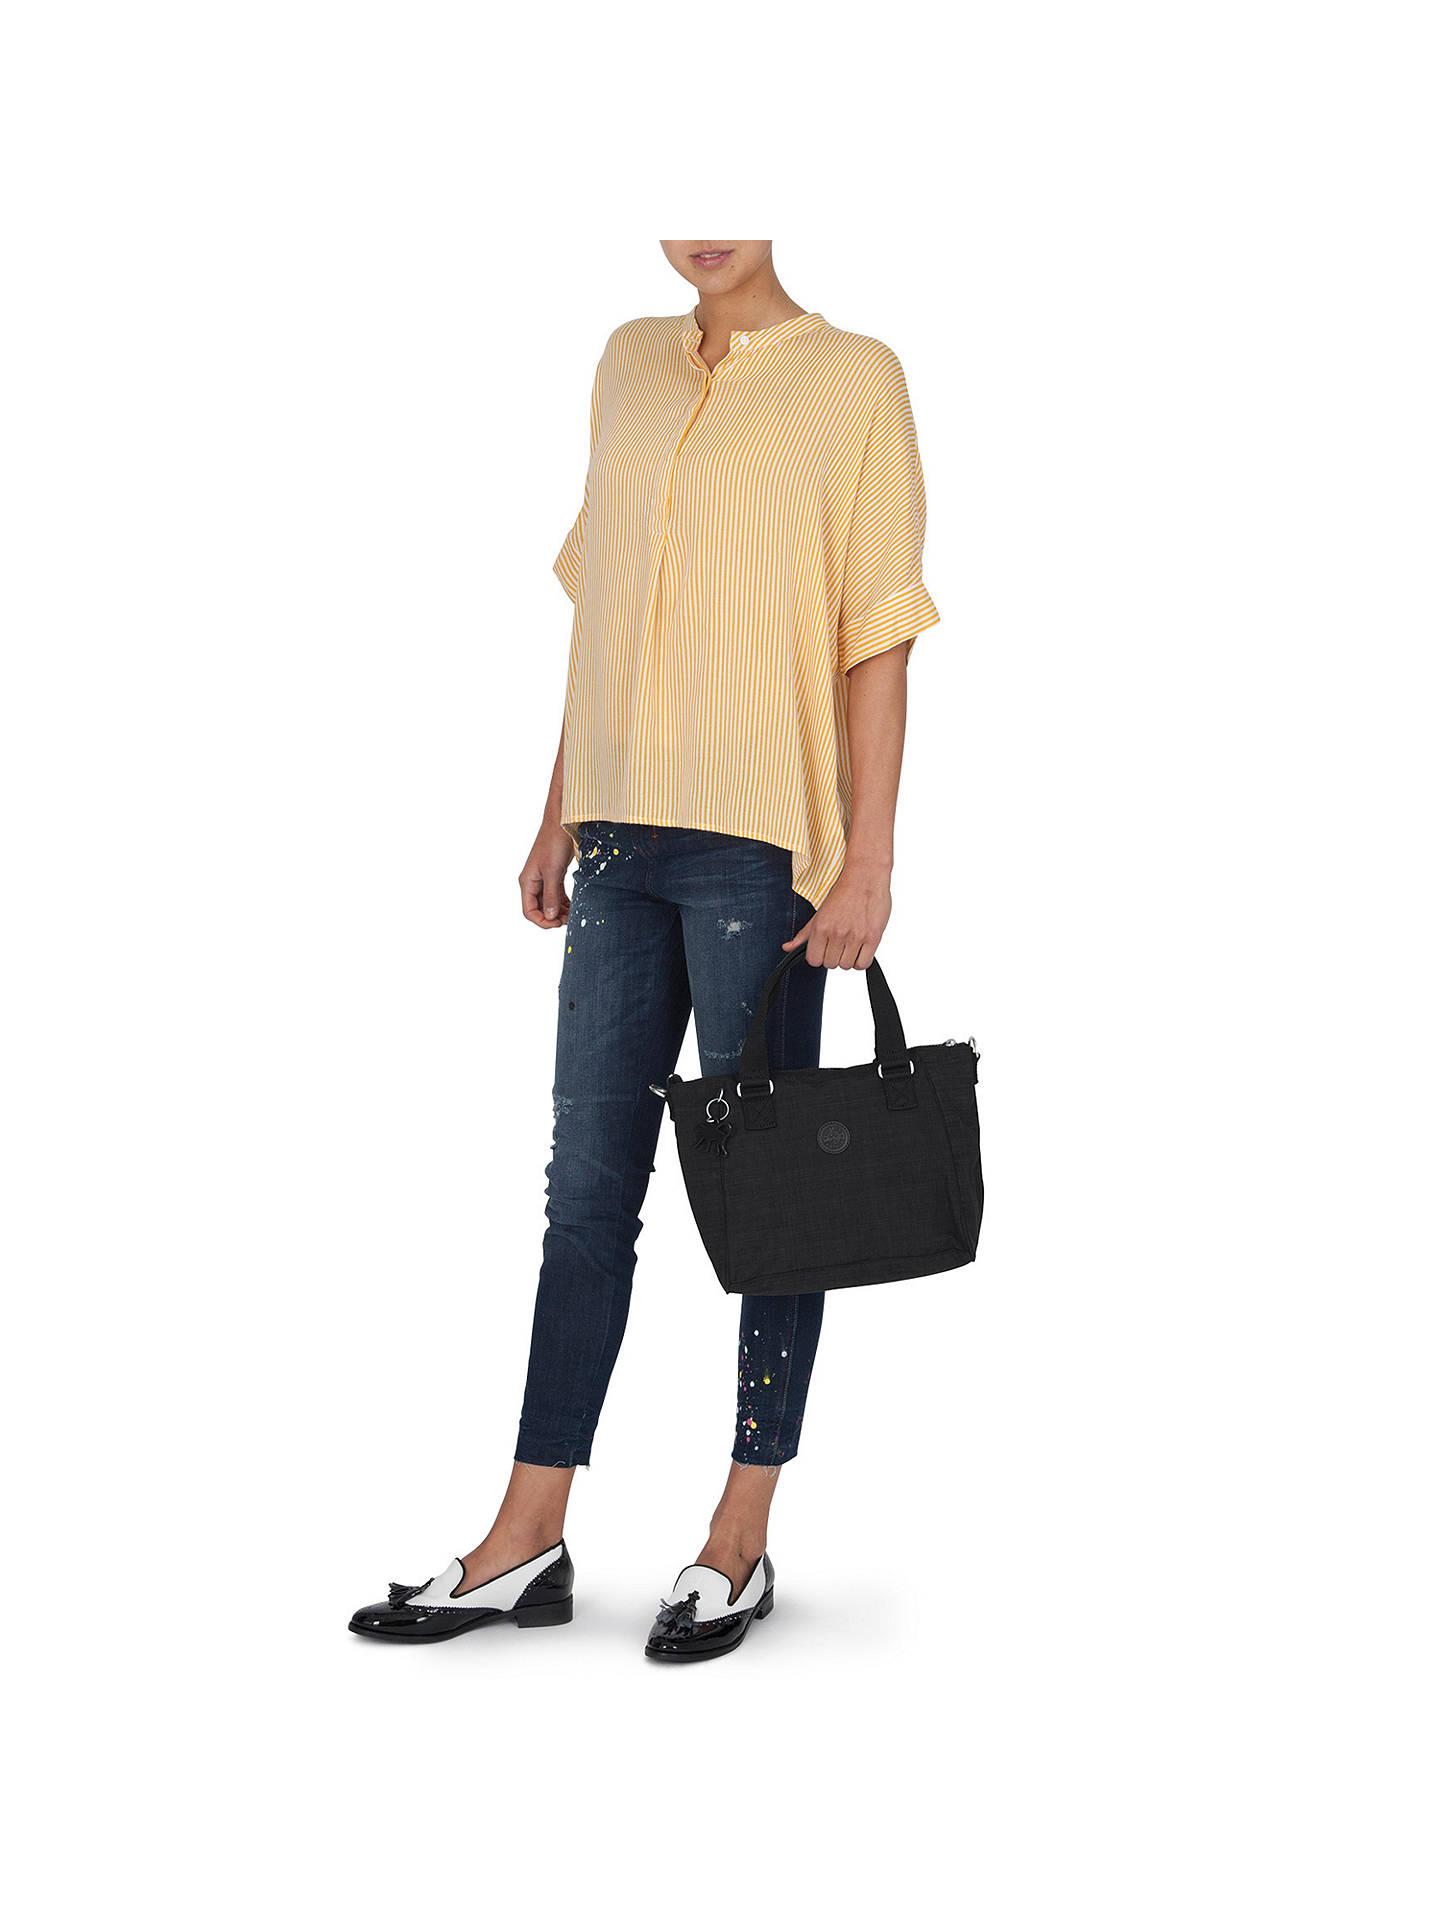 73181ce511 ... Buy Kipling Amiel Medium Shoulder Bag